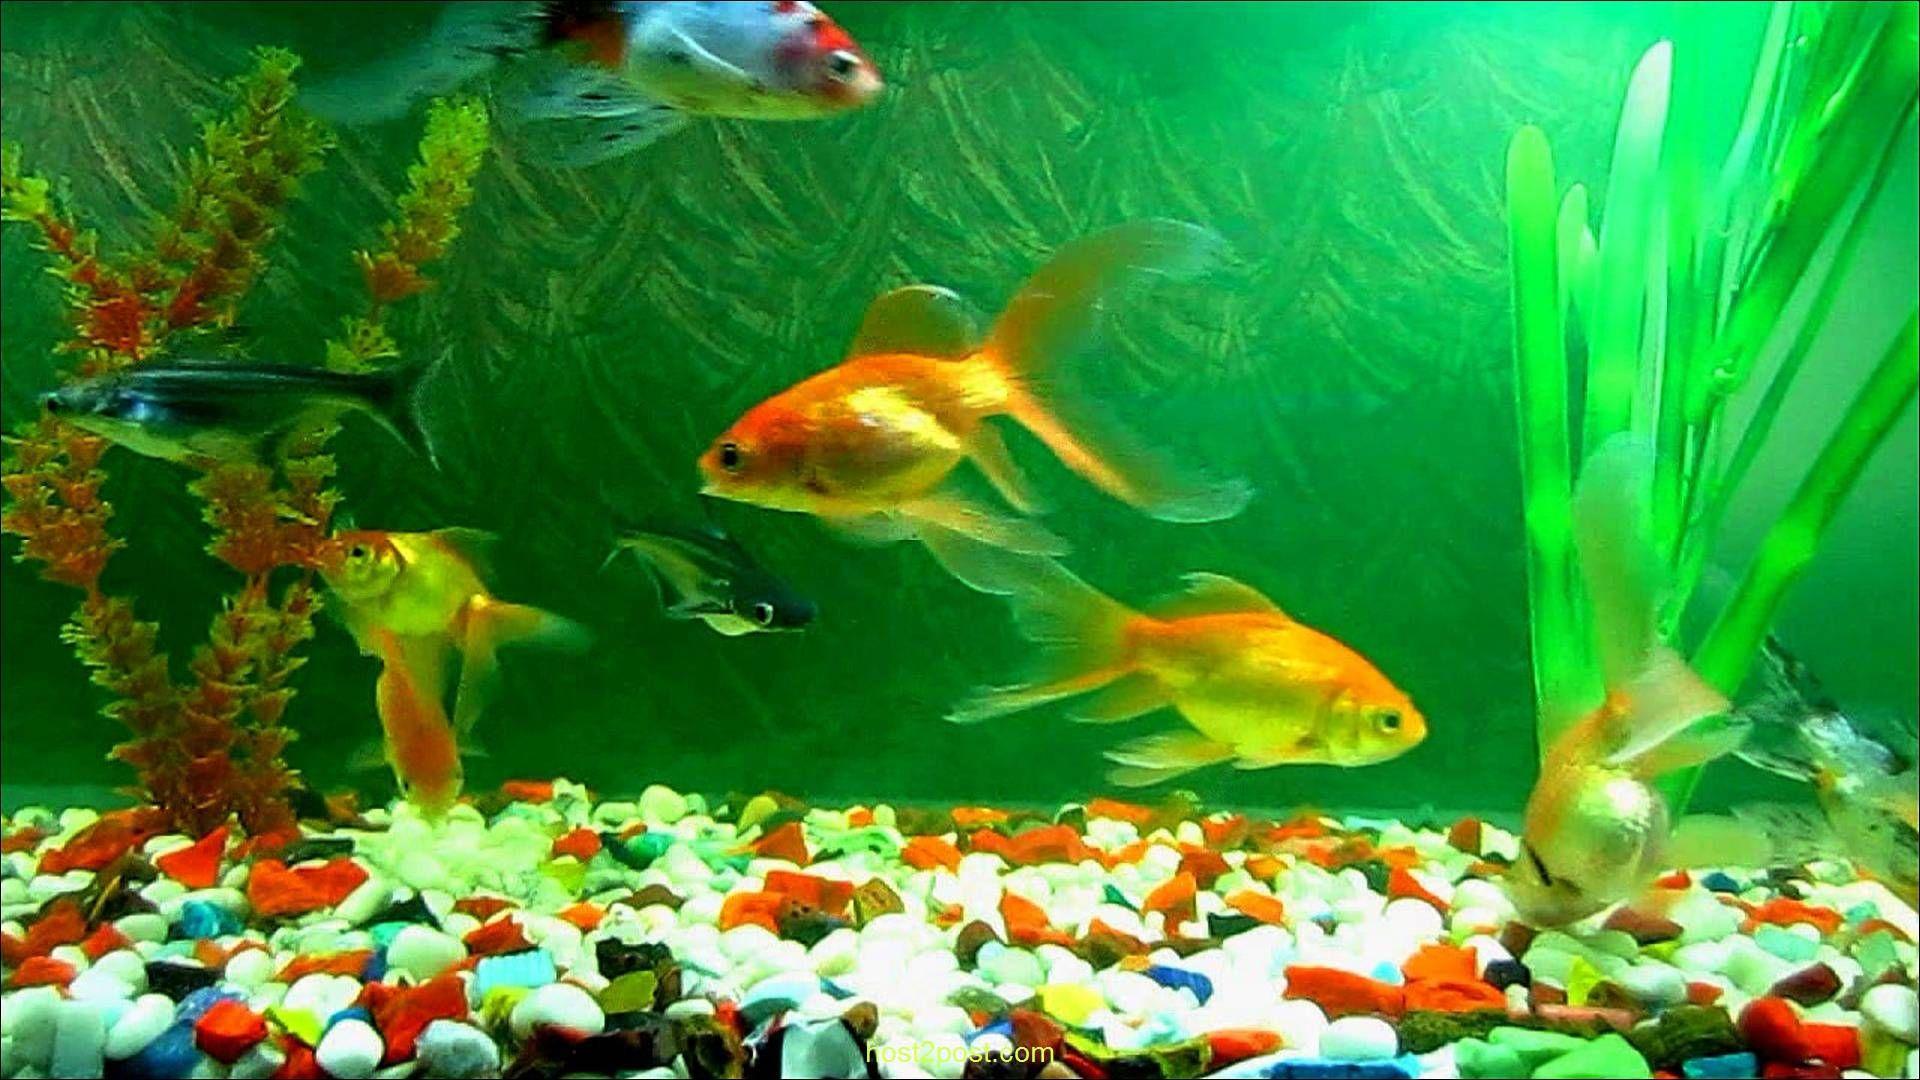 Freshwater aquarium fish ebook free download - Click Here To Download In Hd Format Aquarium Fish 18 Hd Wallpapers Http